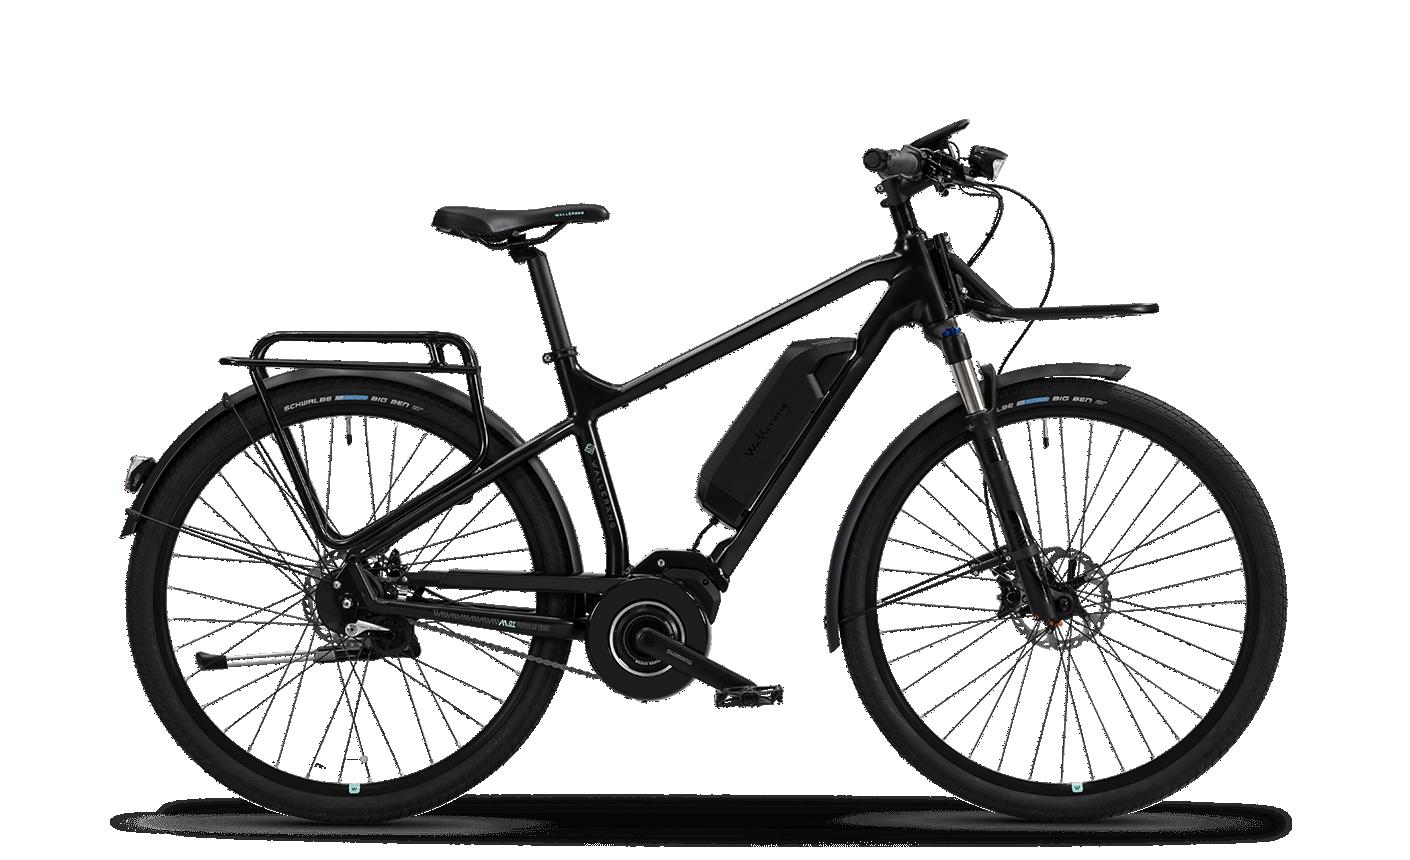 Swedish Made Modular E Bike Combining Scandinavian Sporty Design